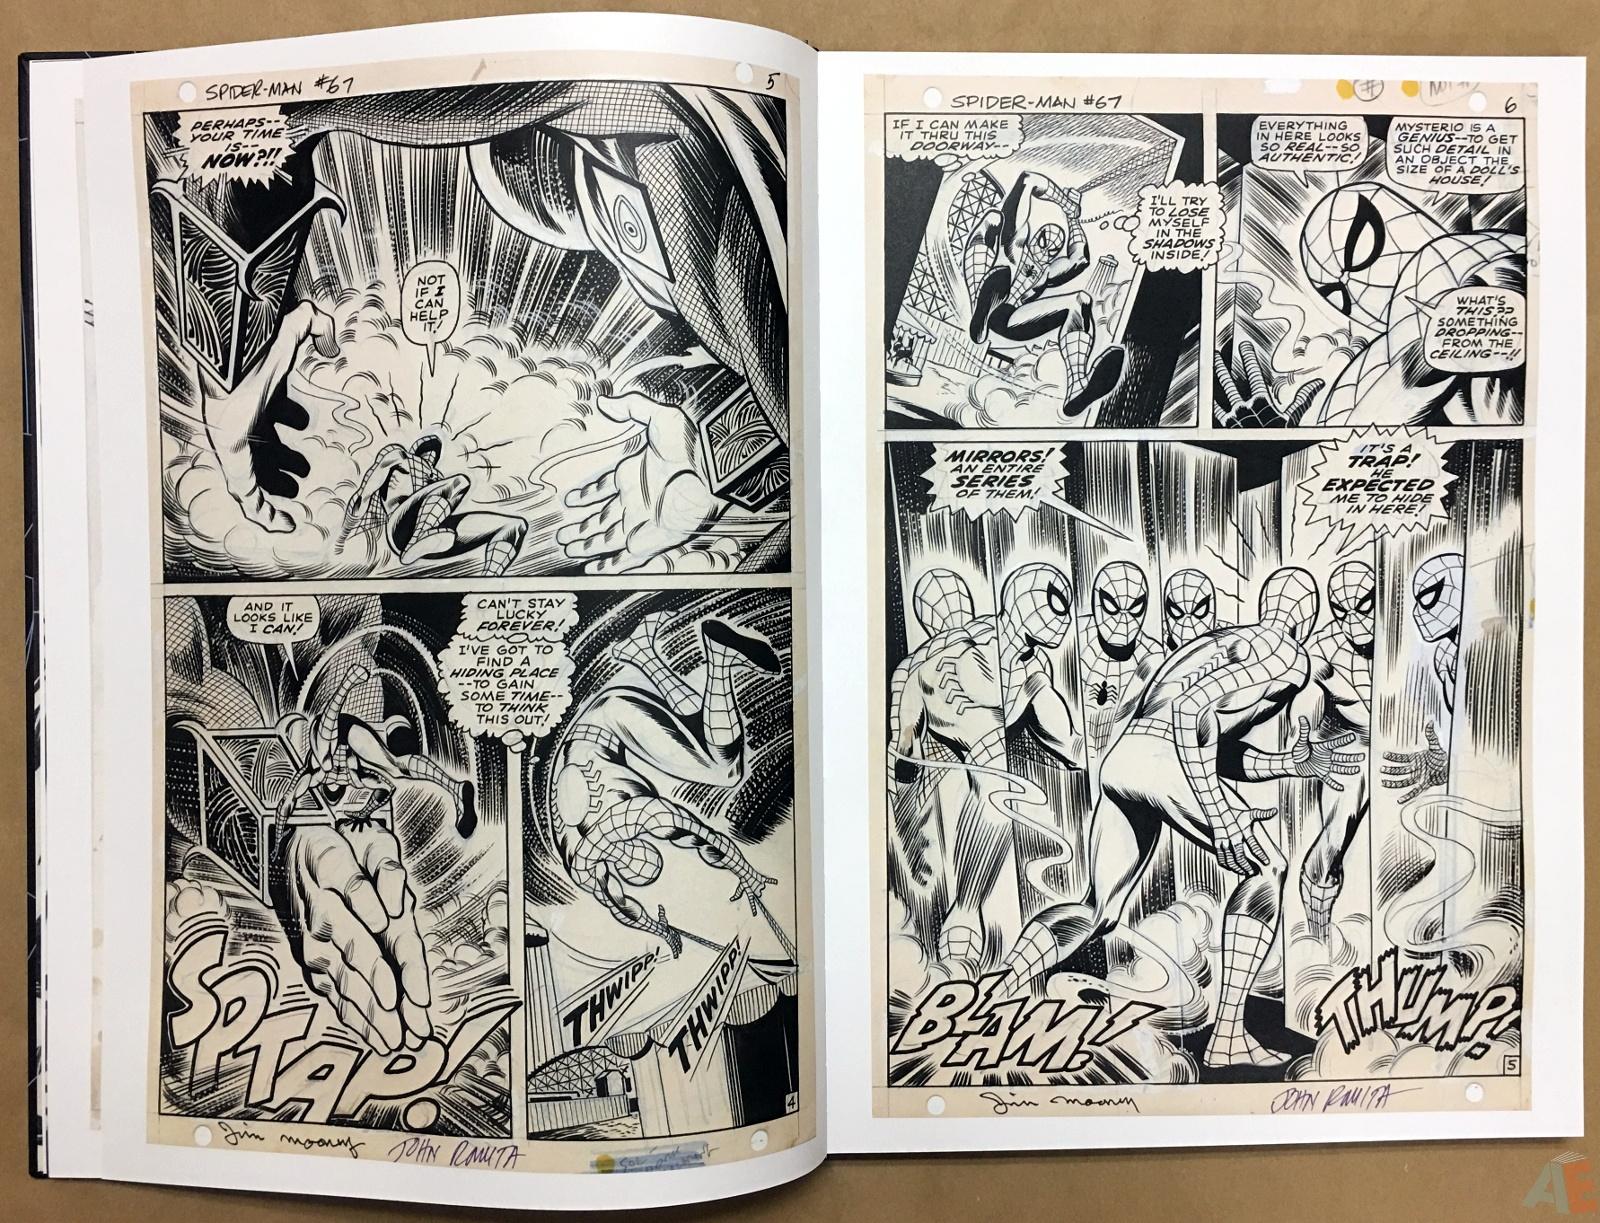 John Romita's The Amazing Spider-Man Artist's Edition 10